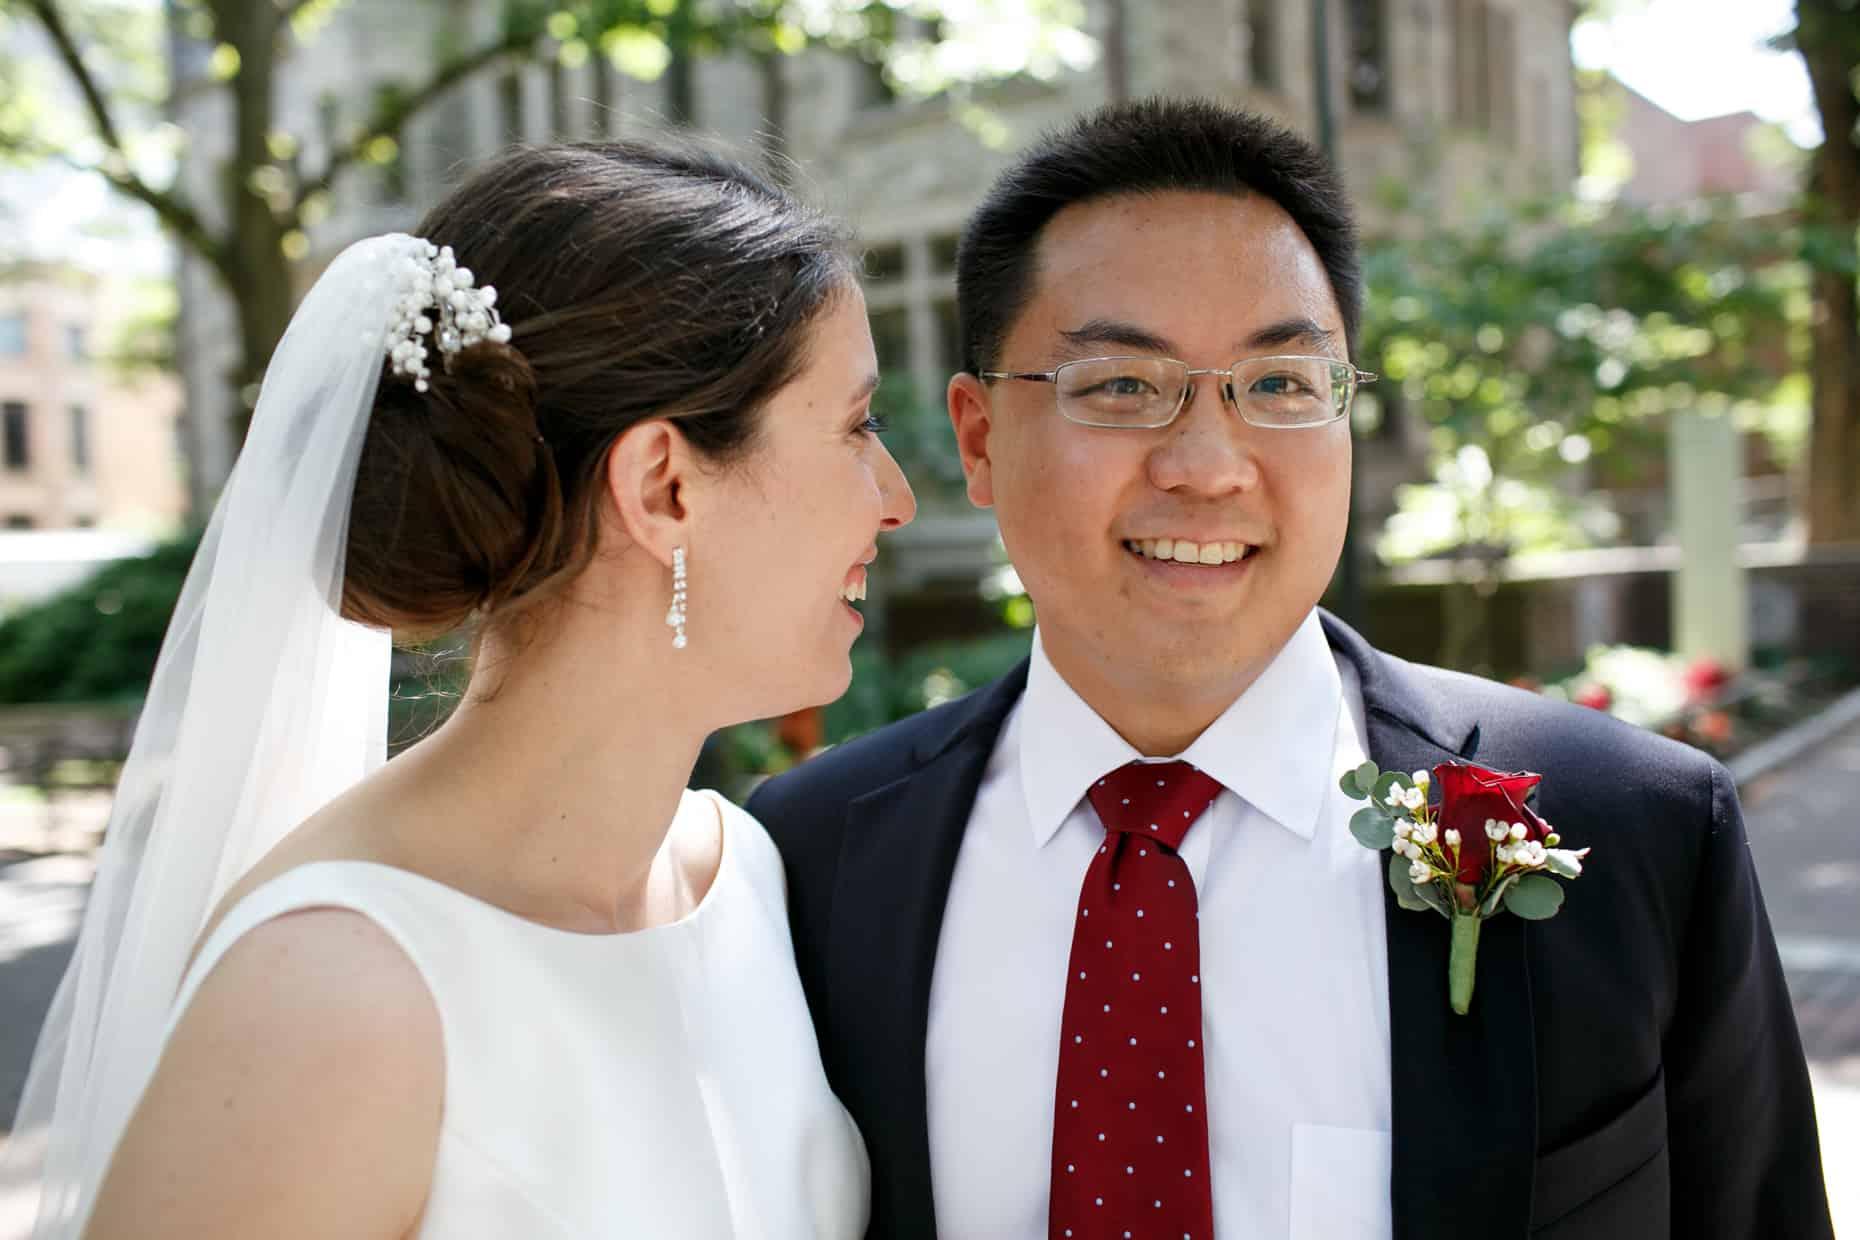 University of Penn Wedding Photo